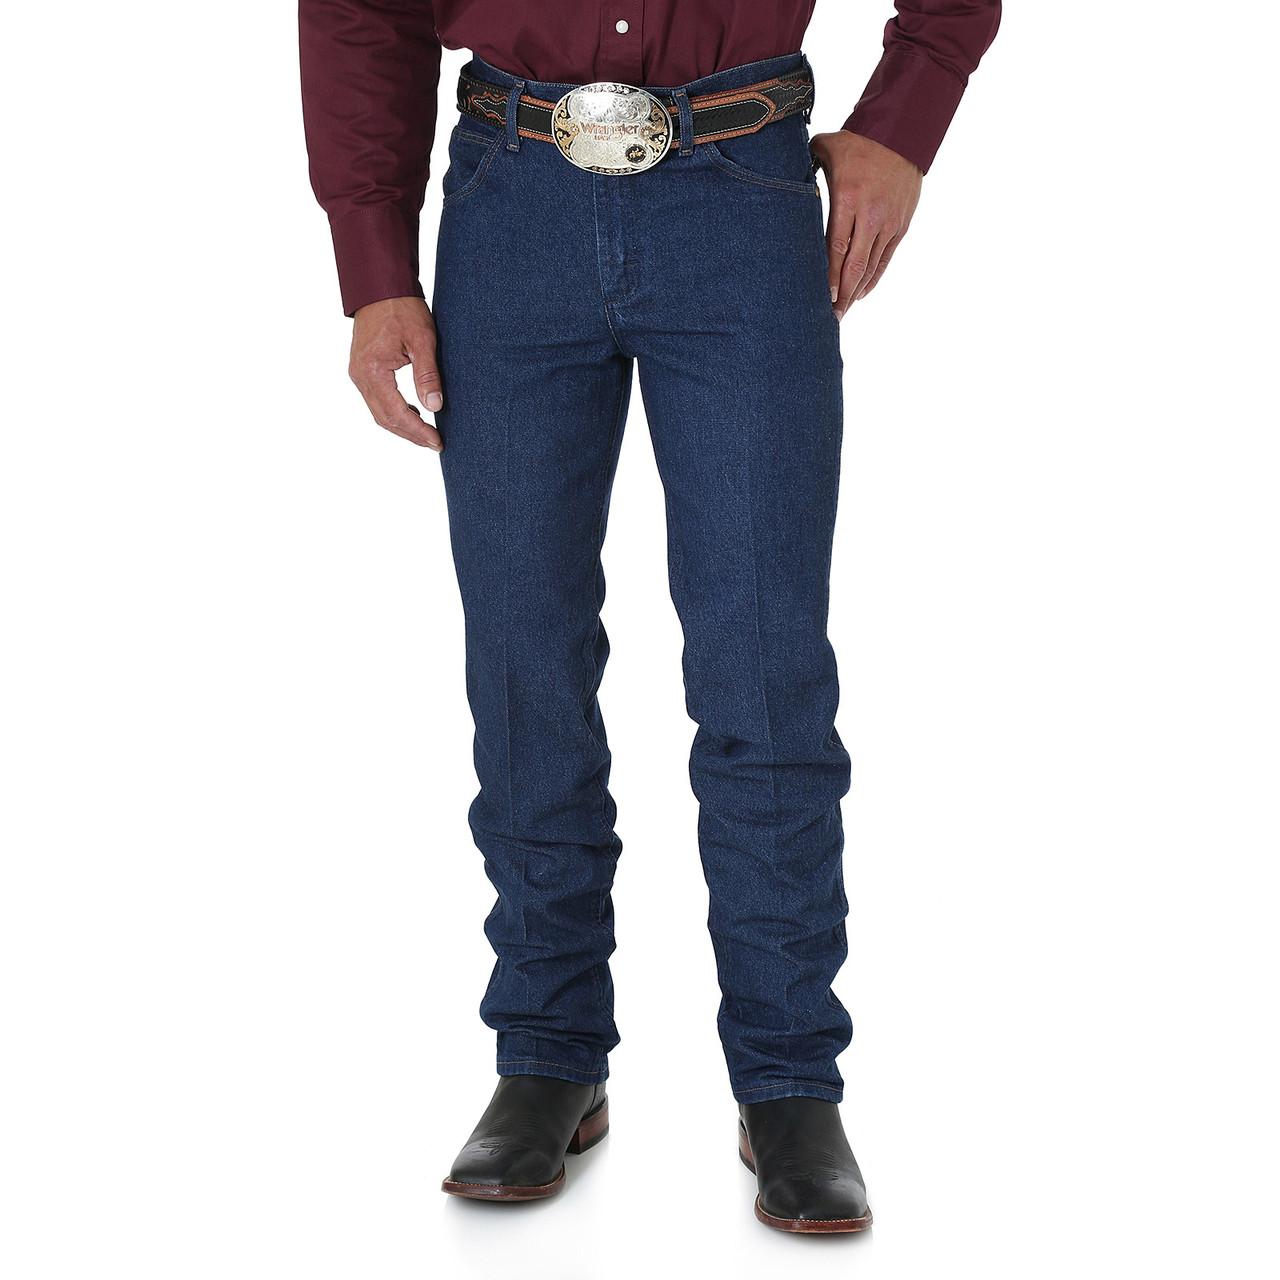 Джинсы Wrangler Premium Performance Cowboy Cut Slim Fit, Prewash, 32W30L, 36MWZPD